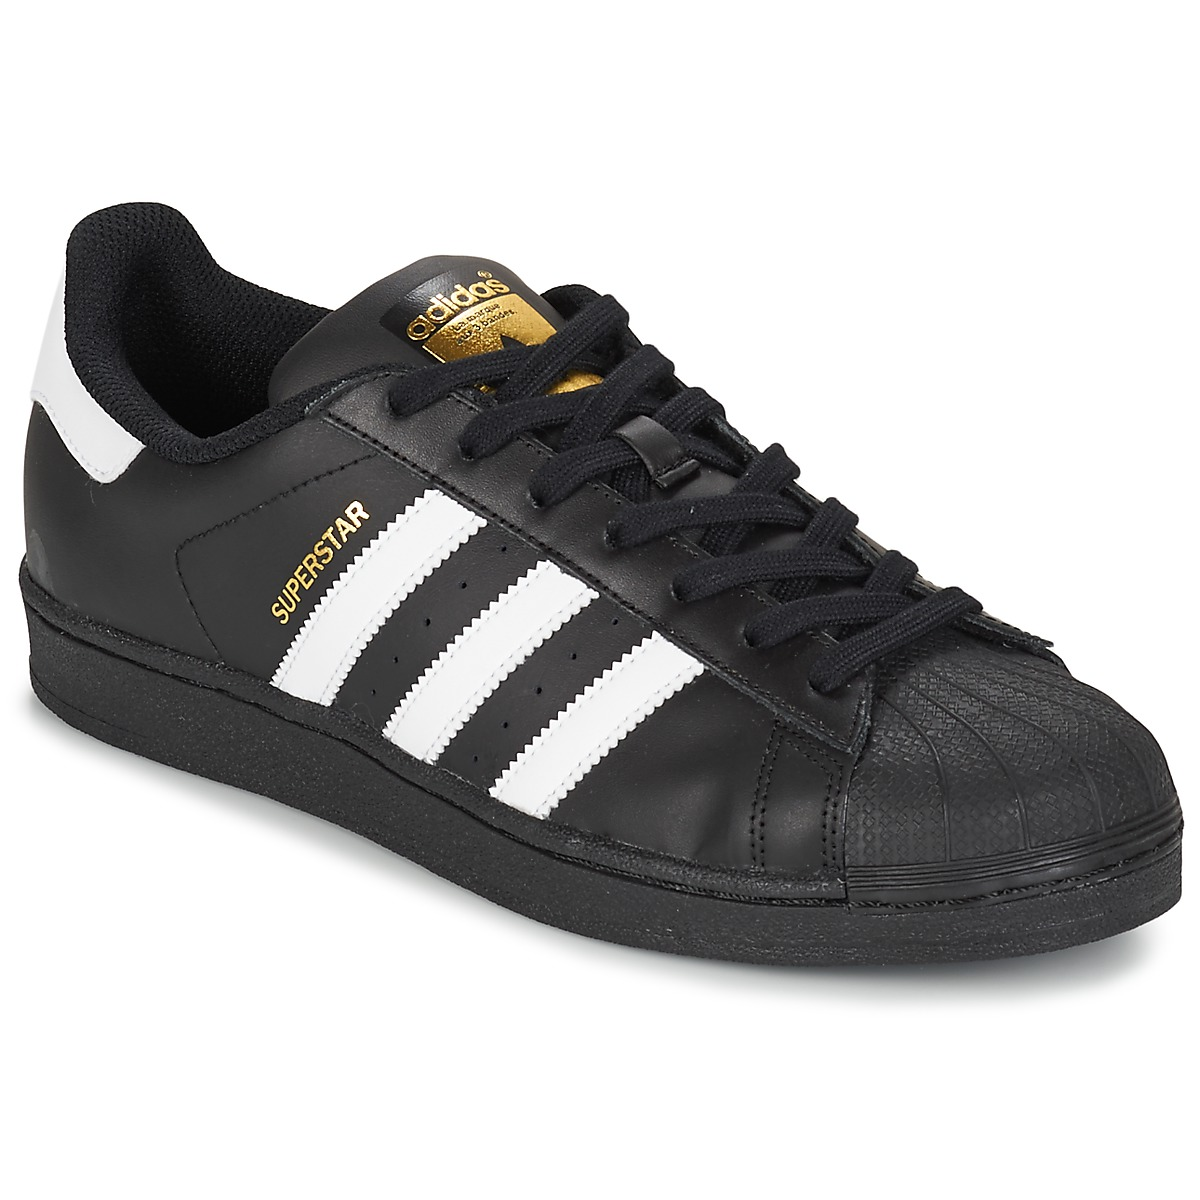 Adidas Neo Maat 24